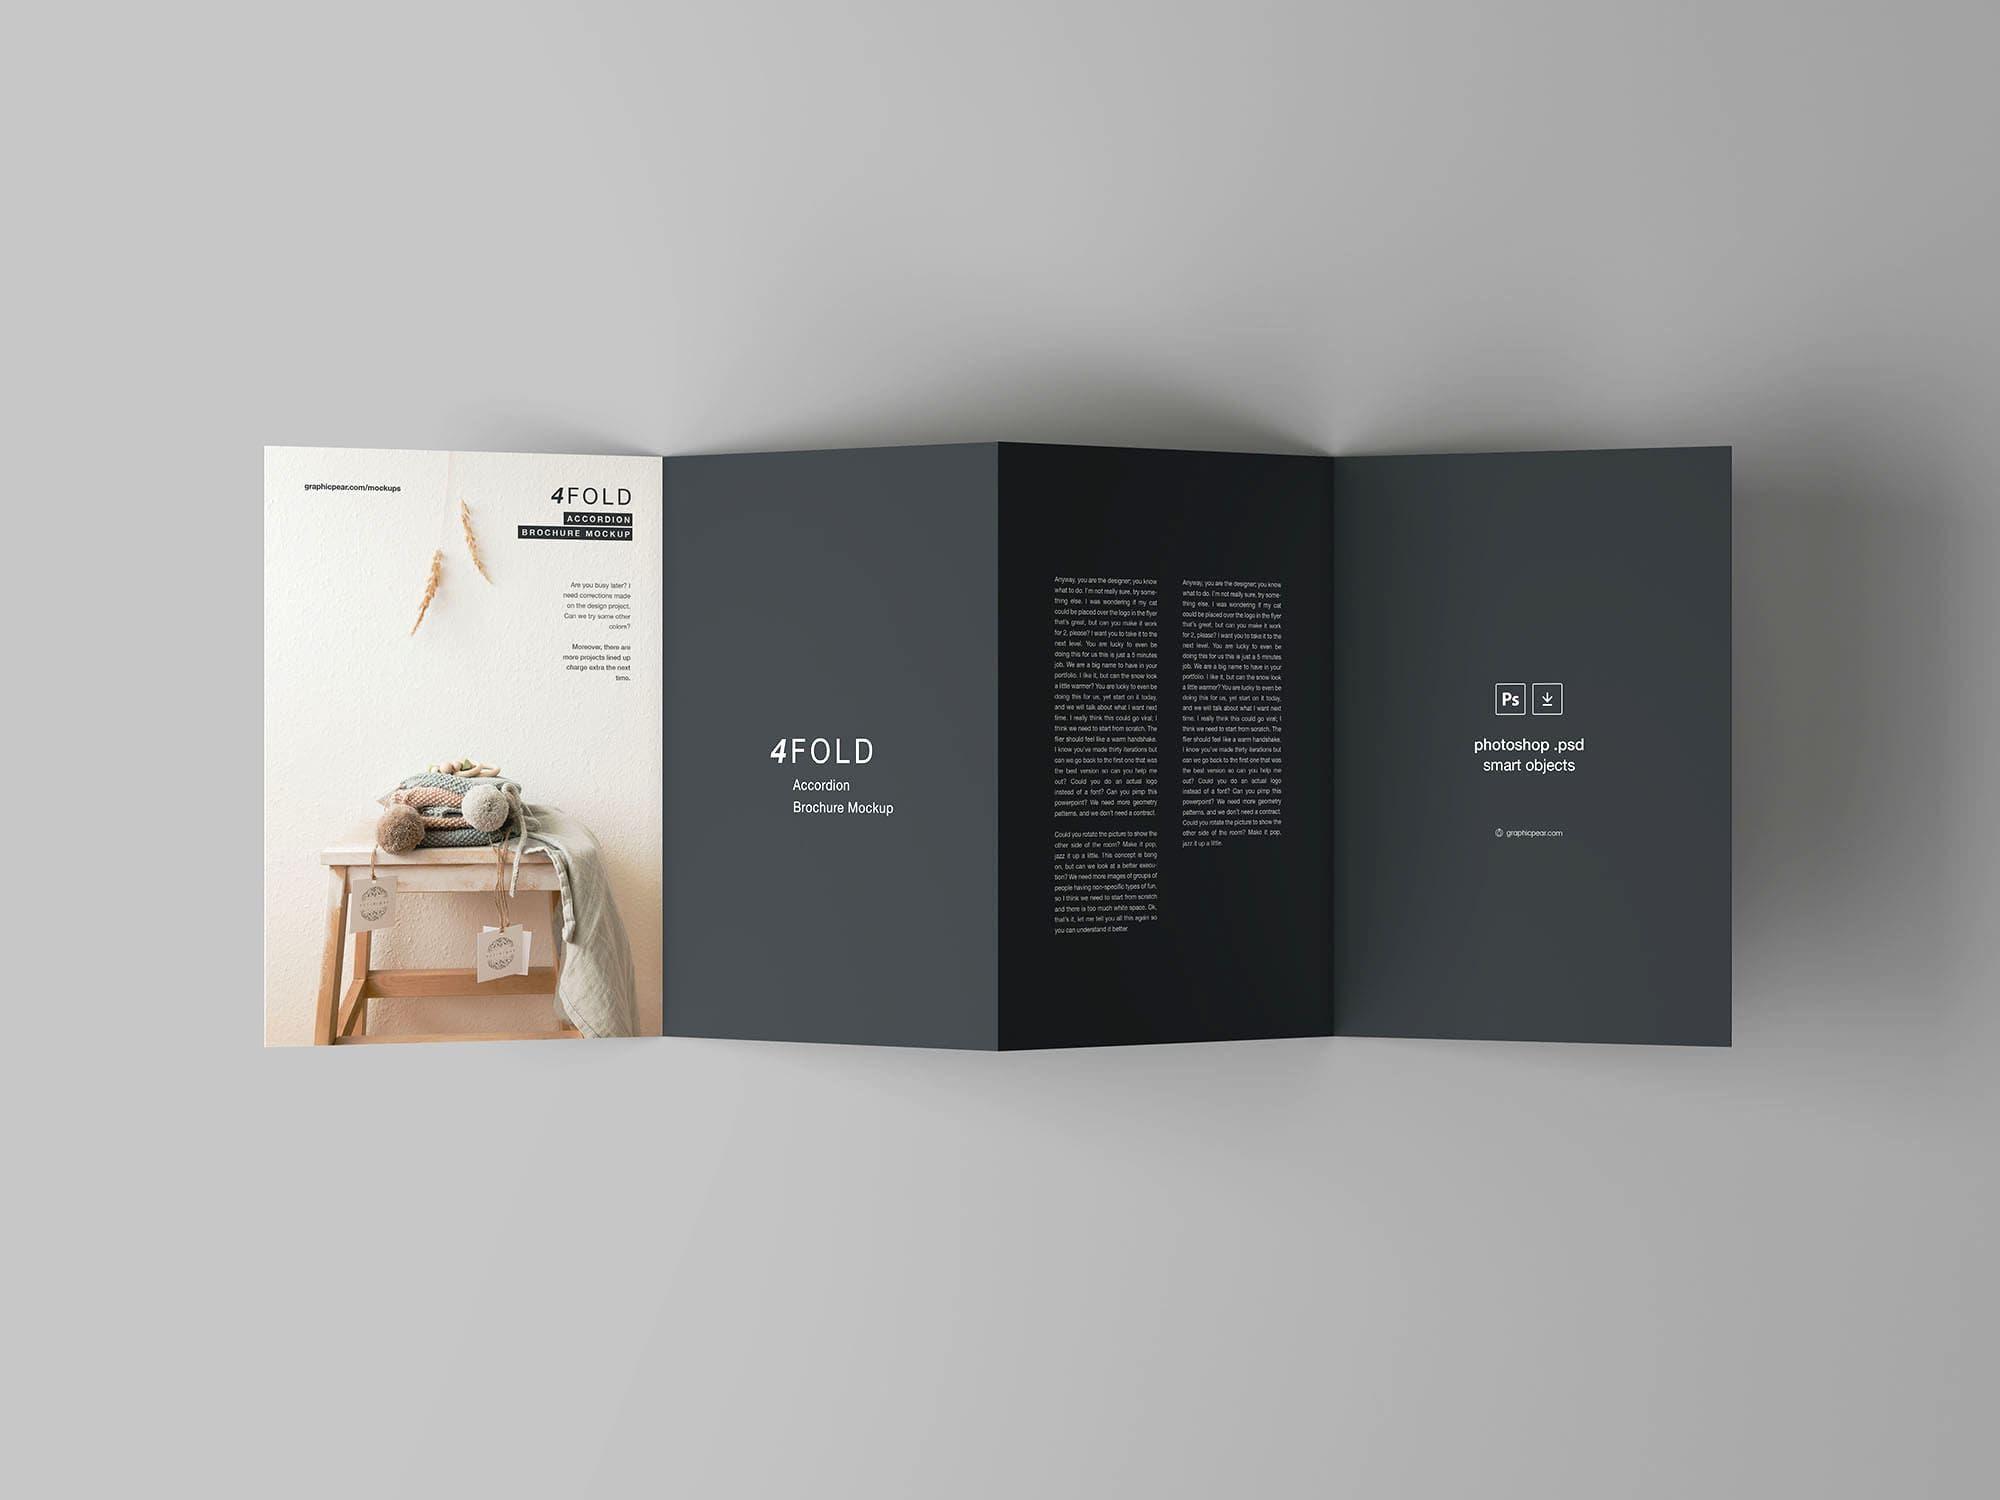 Free 4 Fold Accordion Brochure Mockup Broschure Design Broschure Broschurendesign